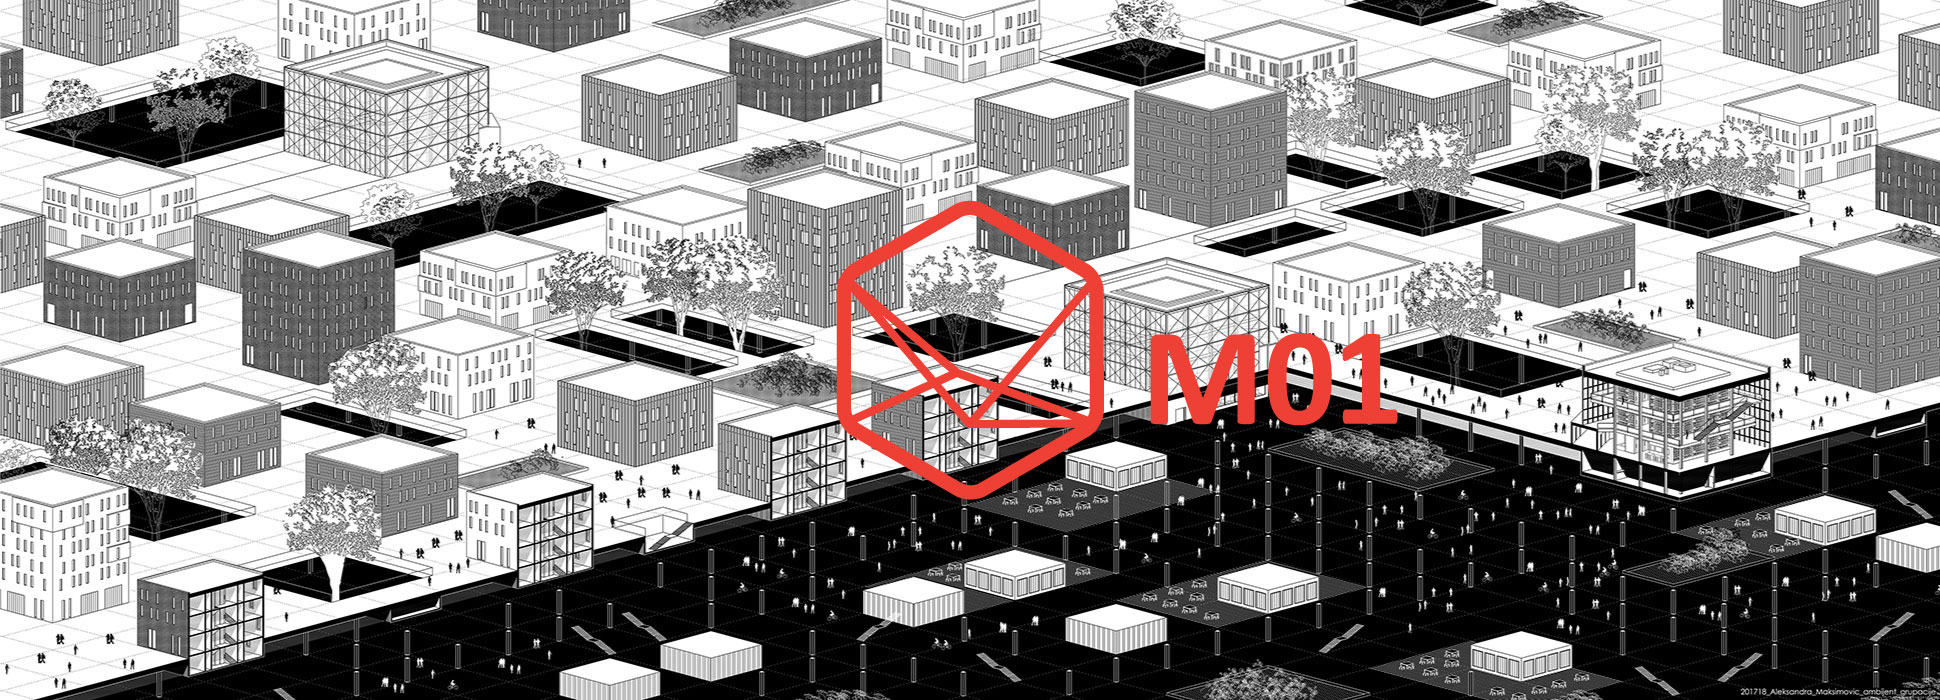 201718_Studio-M01-Projekat_cover